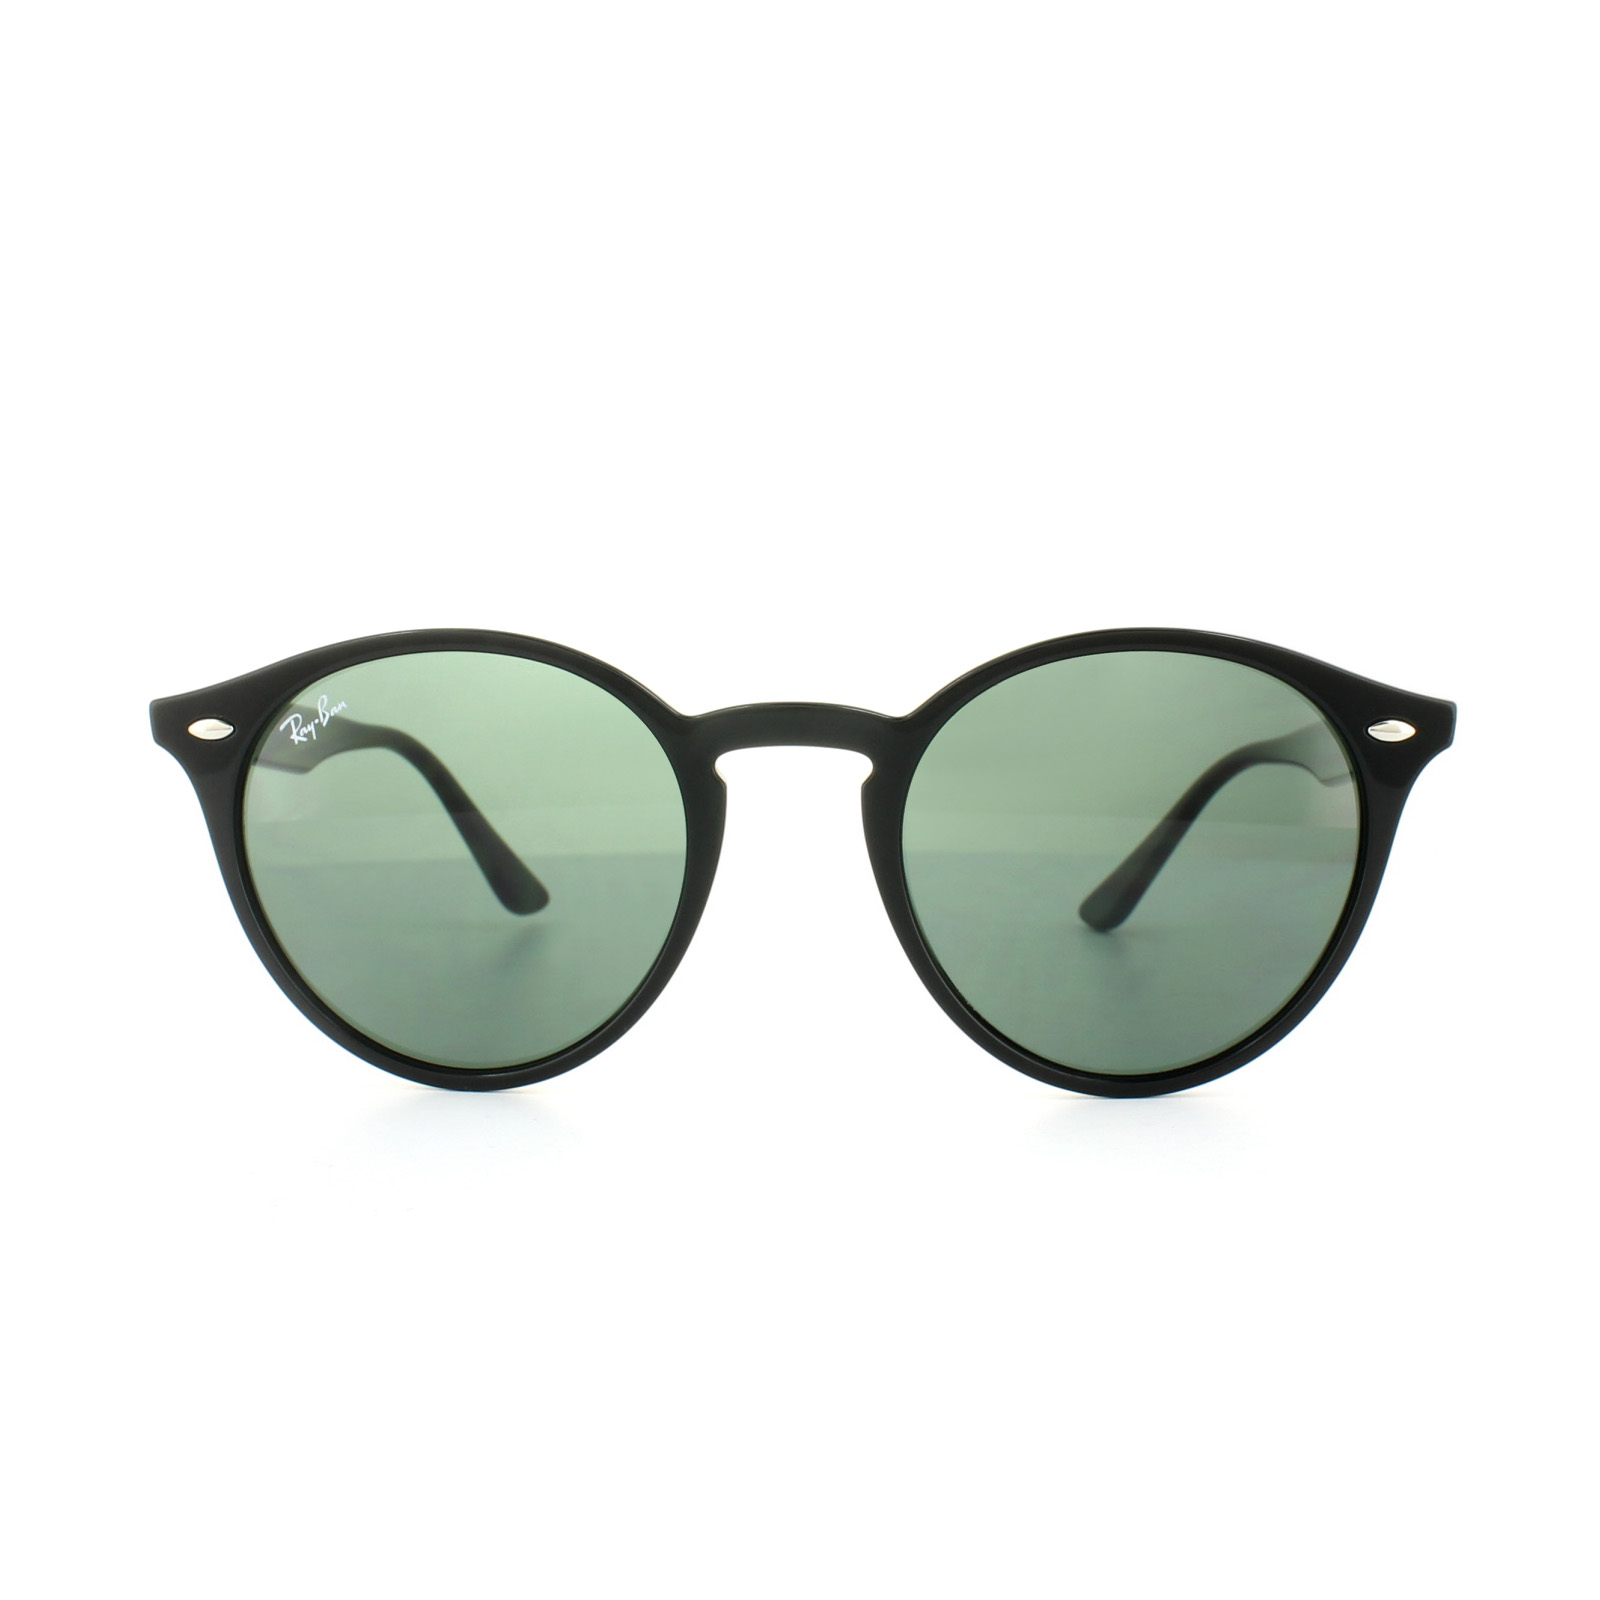 4d03f289415 Ray-Ban Sunglasses 2180 601 71 Black Green 51mm 8053672546941